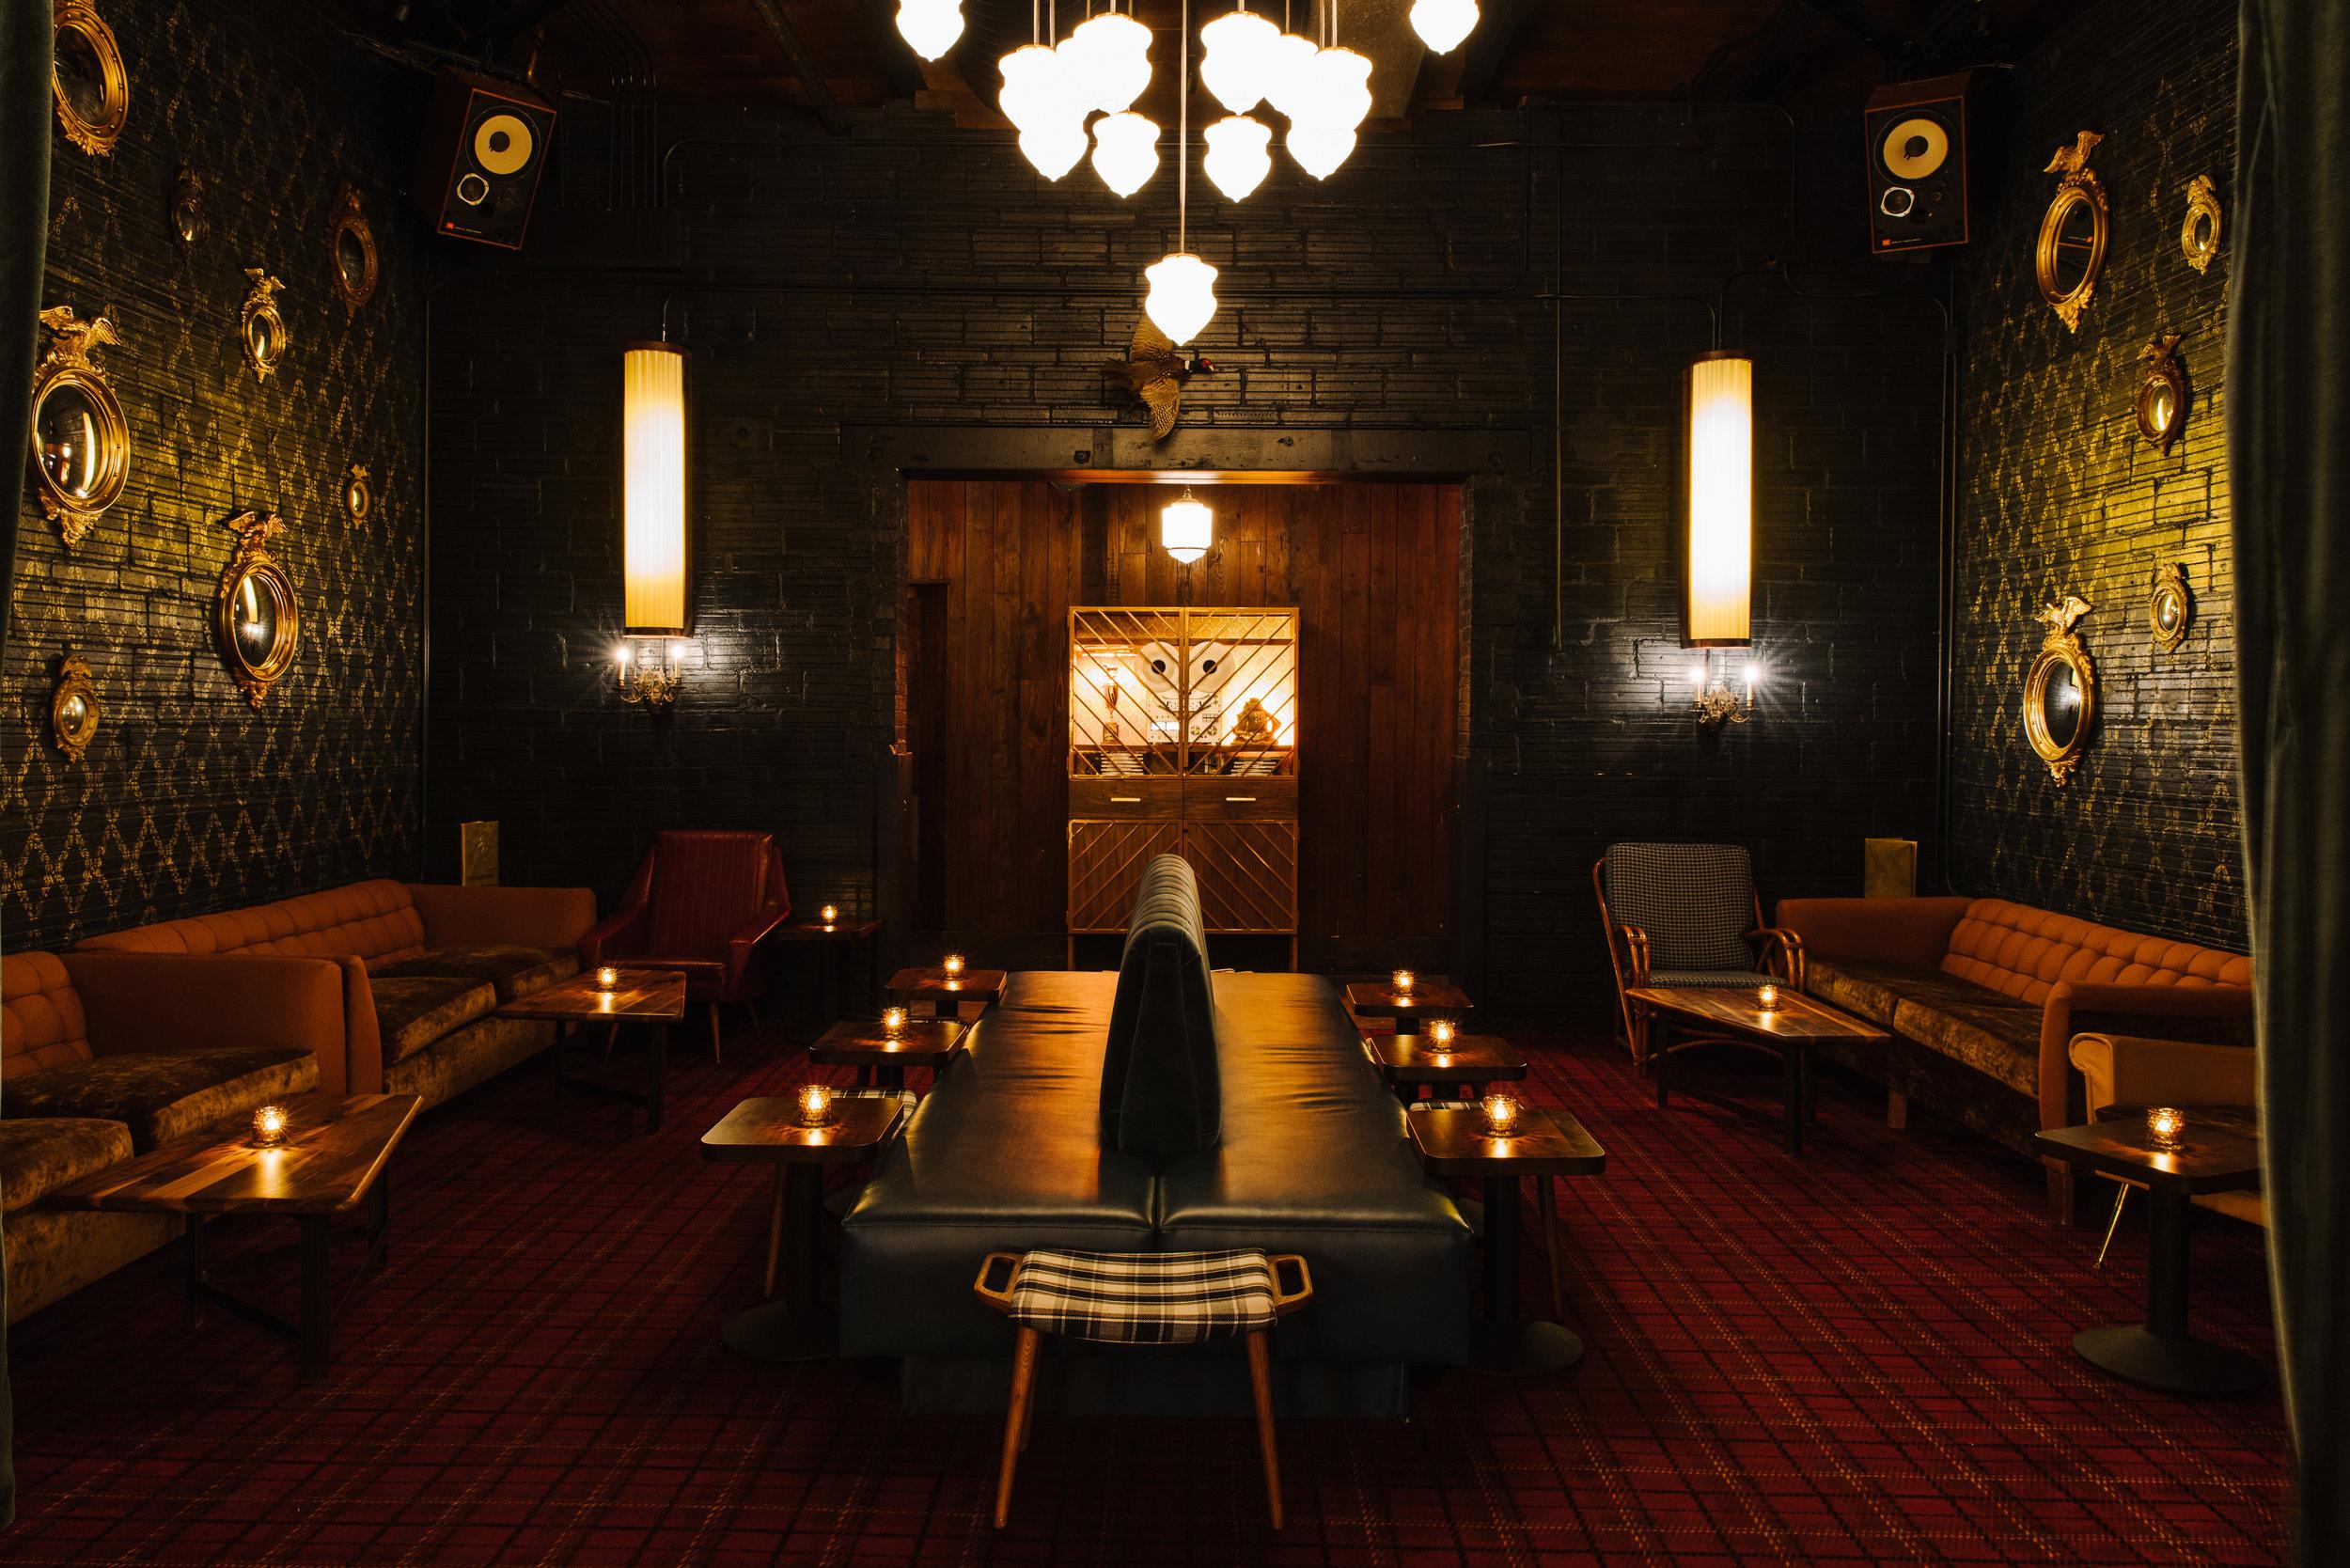 Golden Eagle Living Room Lounge, designed by Elizabeth Ingram. Photo: Andrew Thomas Lee